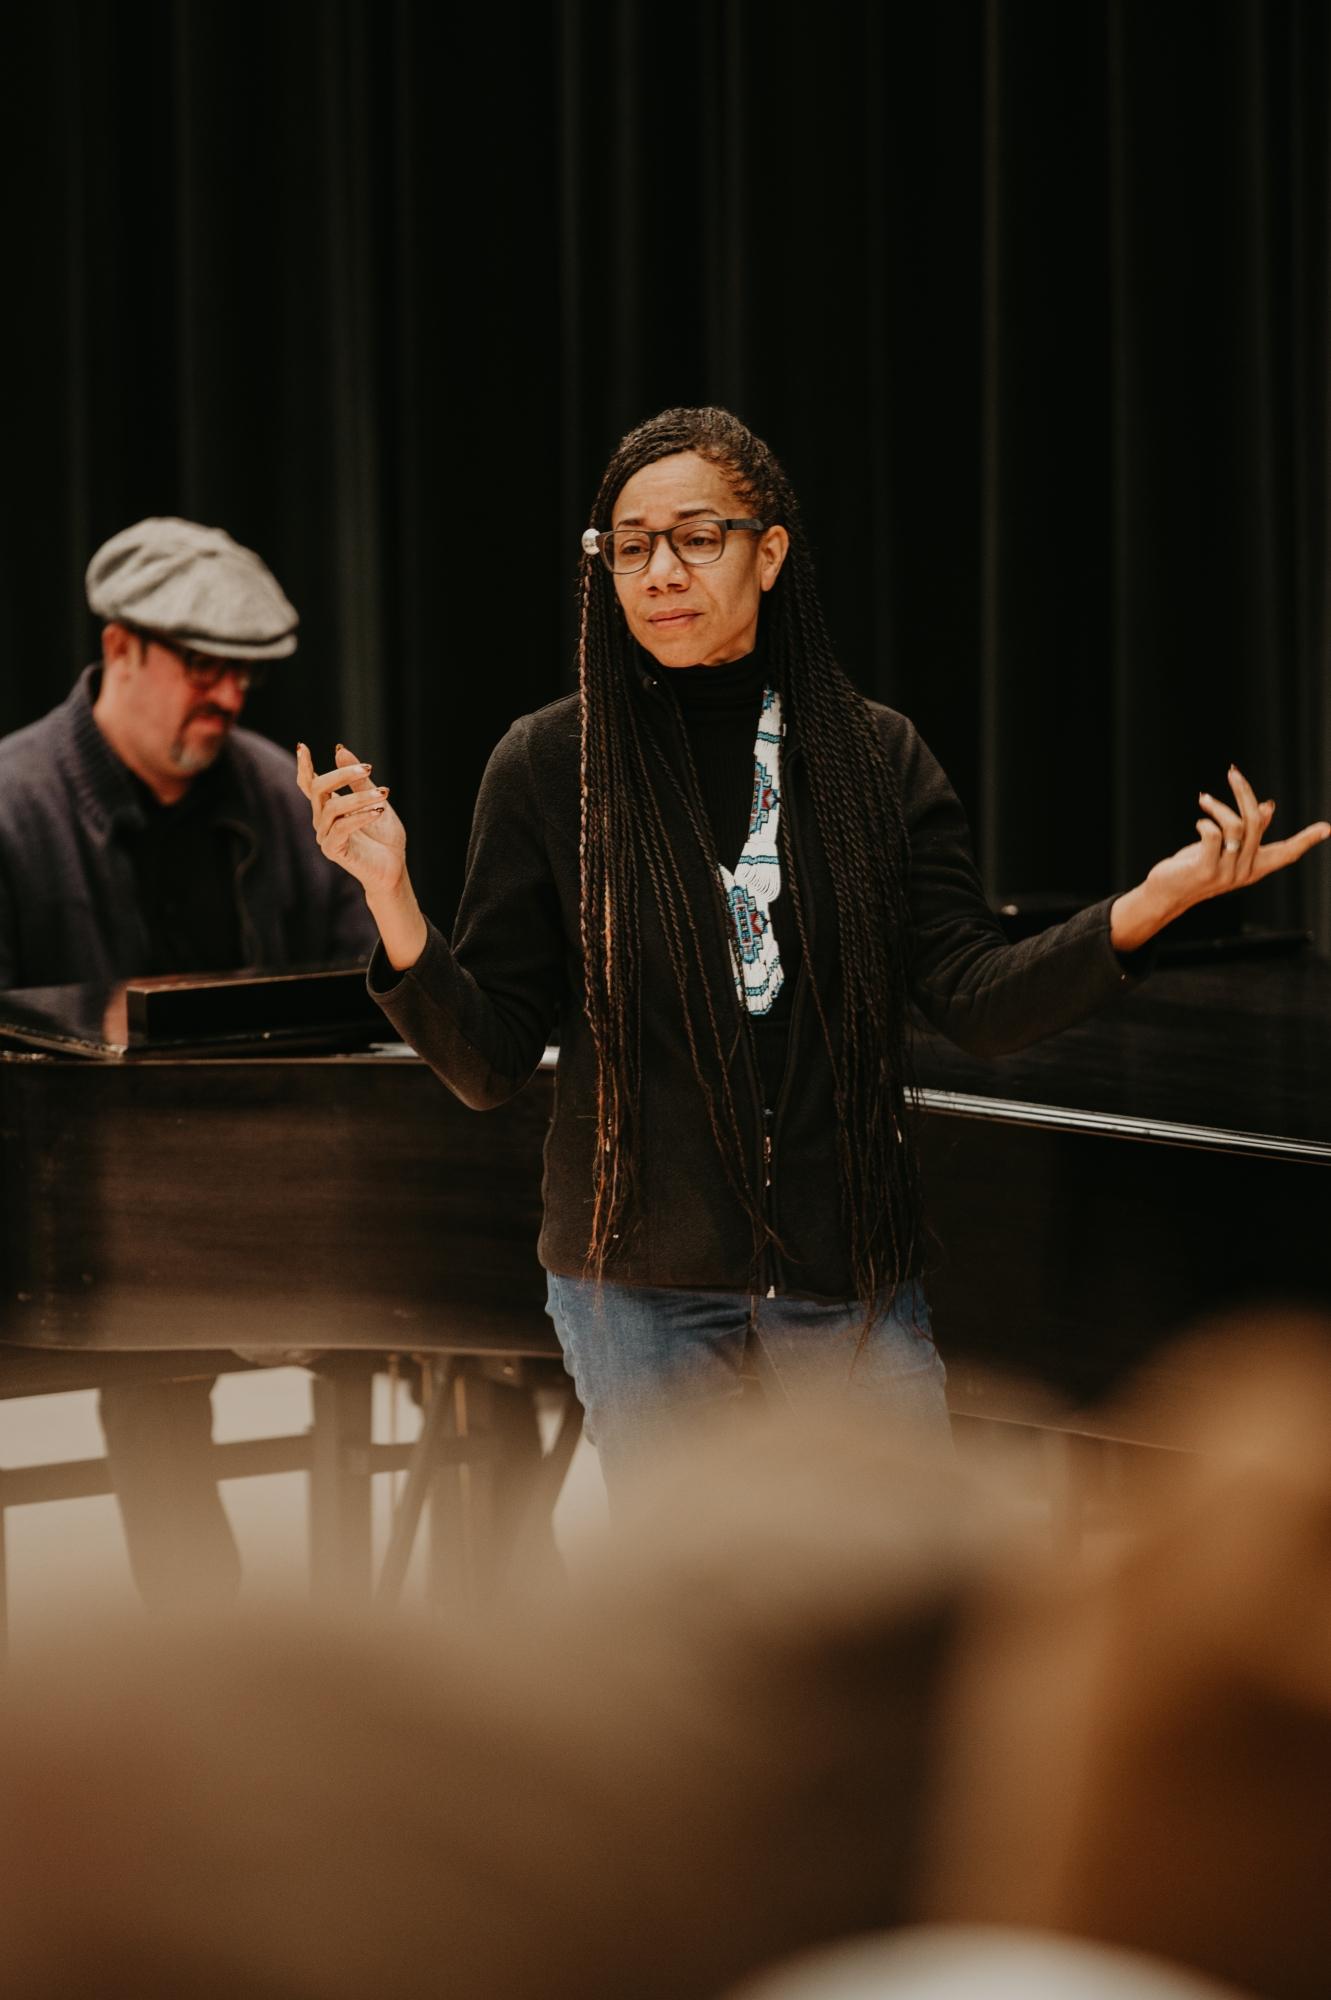 Martha Redbone speaking during Convocation